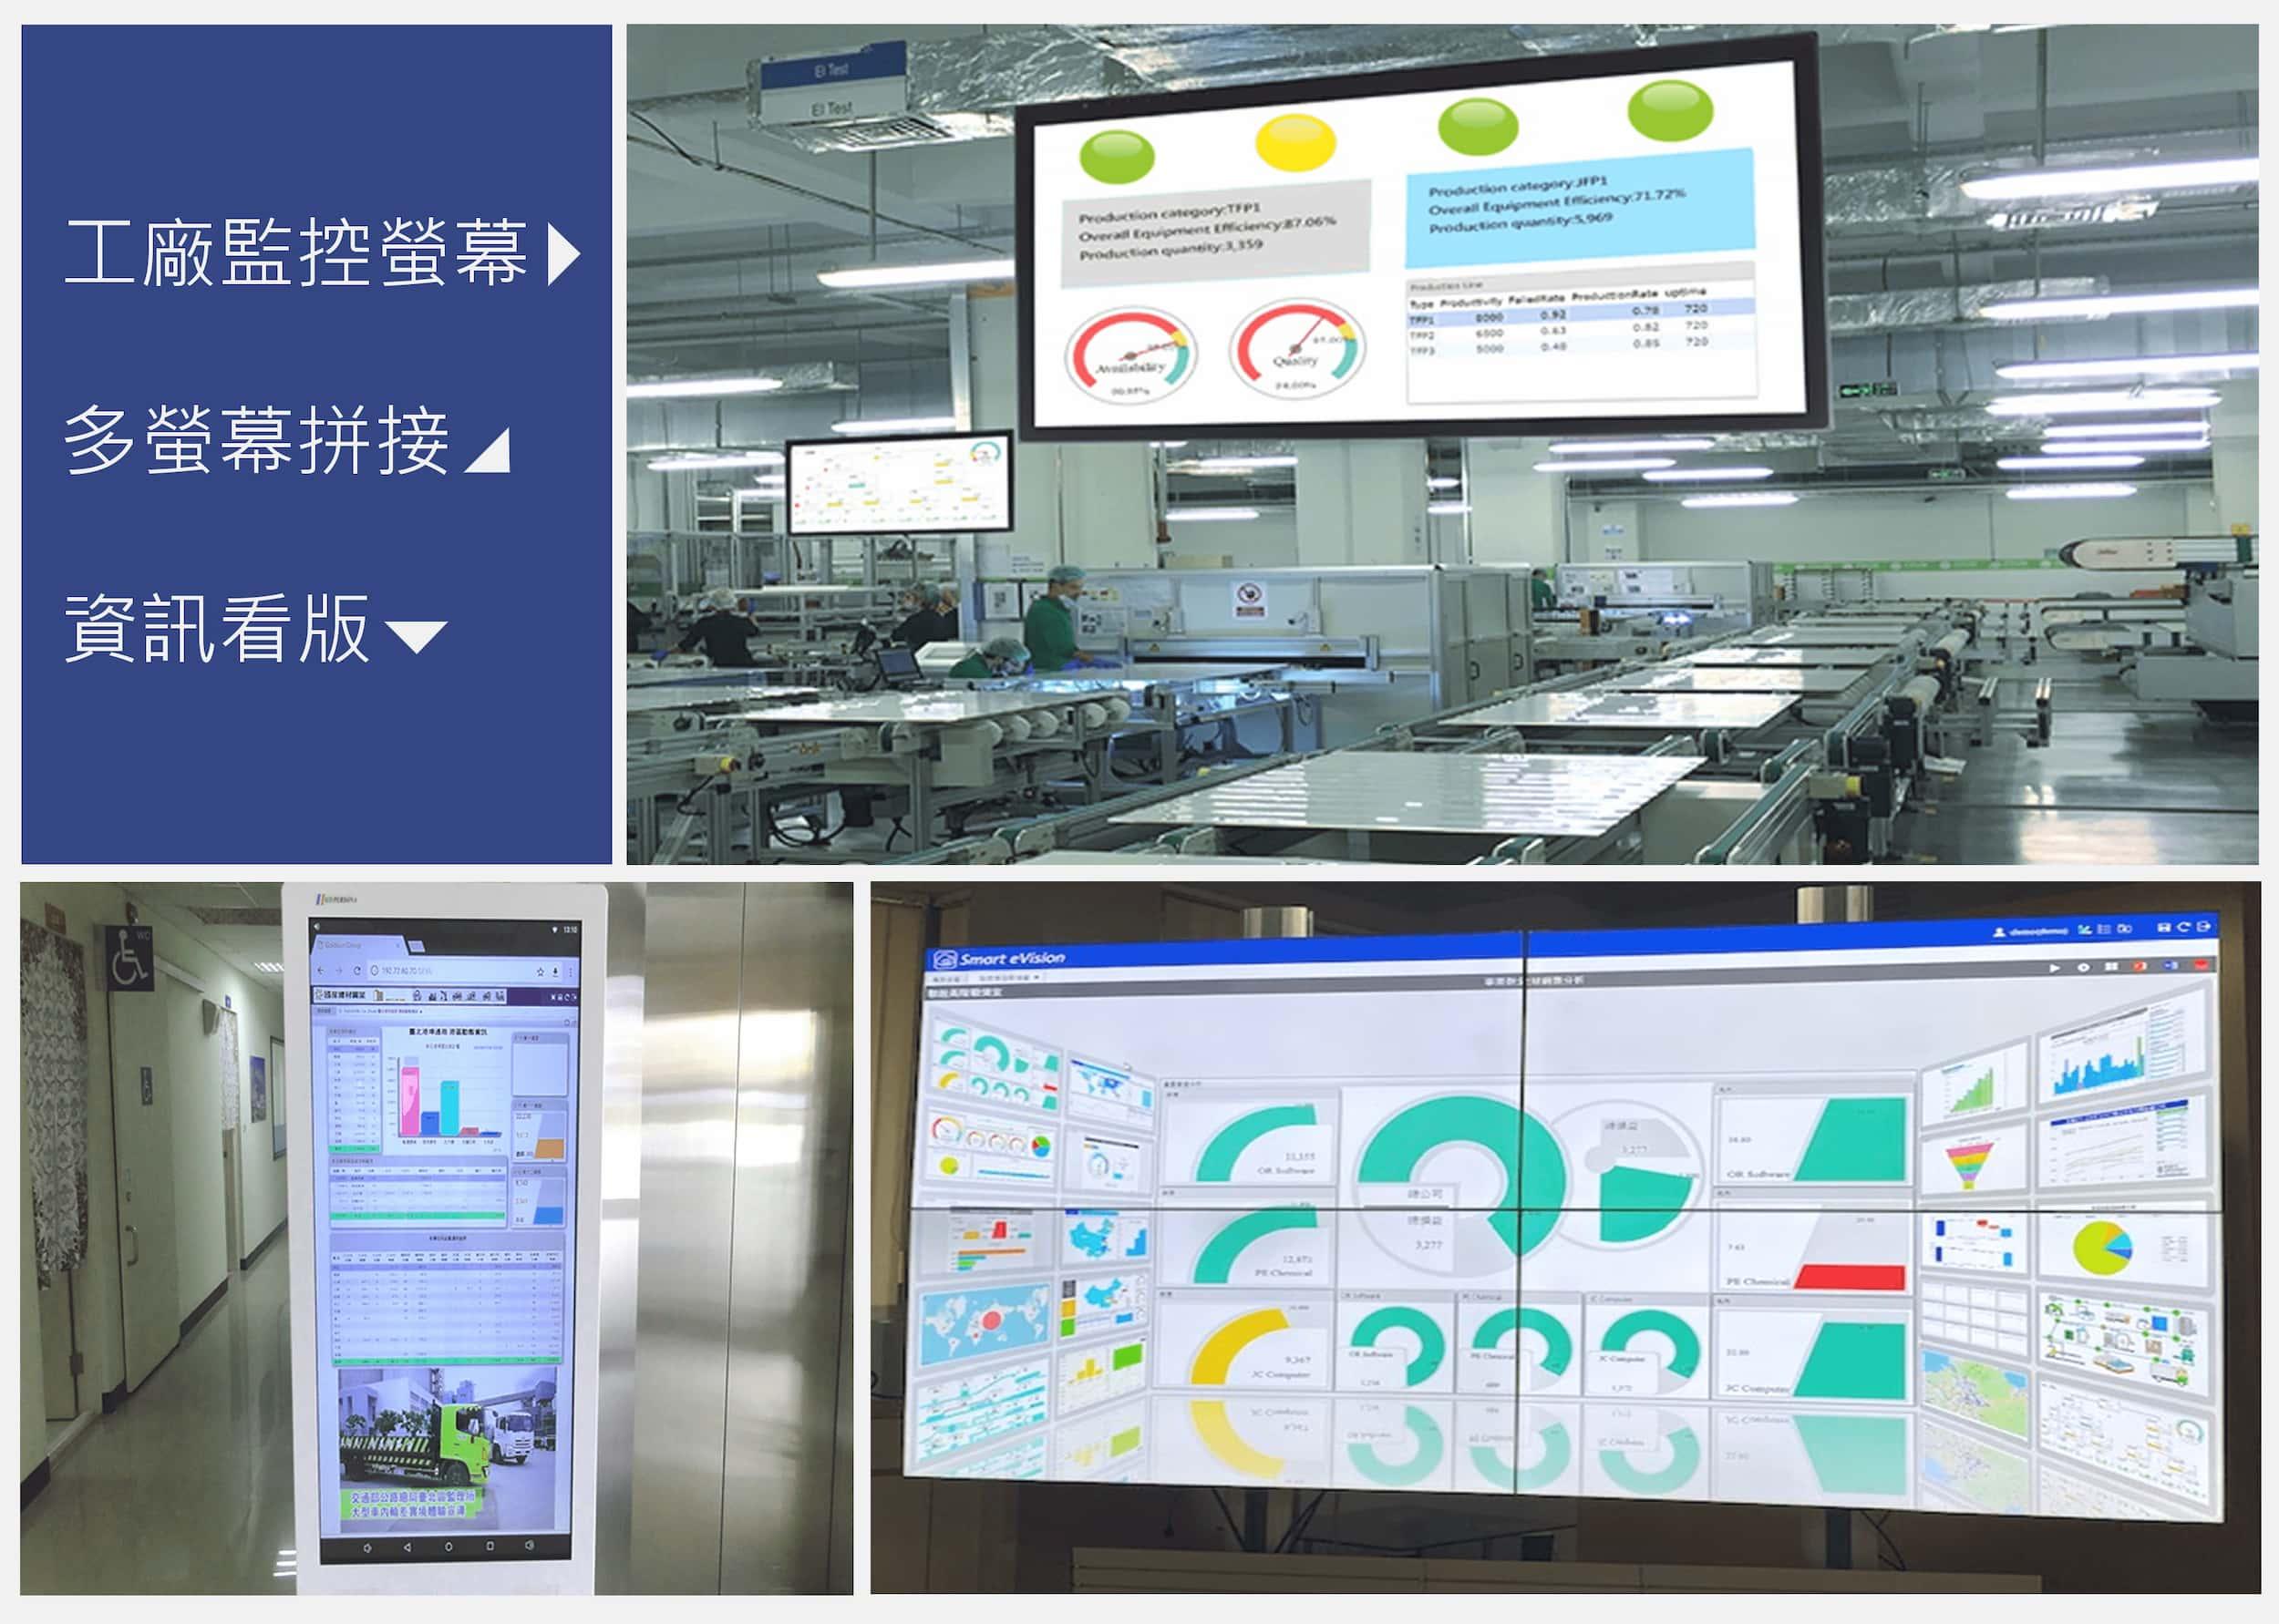 Smart eVision 戰情室、儀表板實際應用